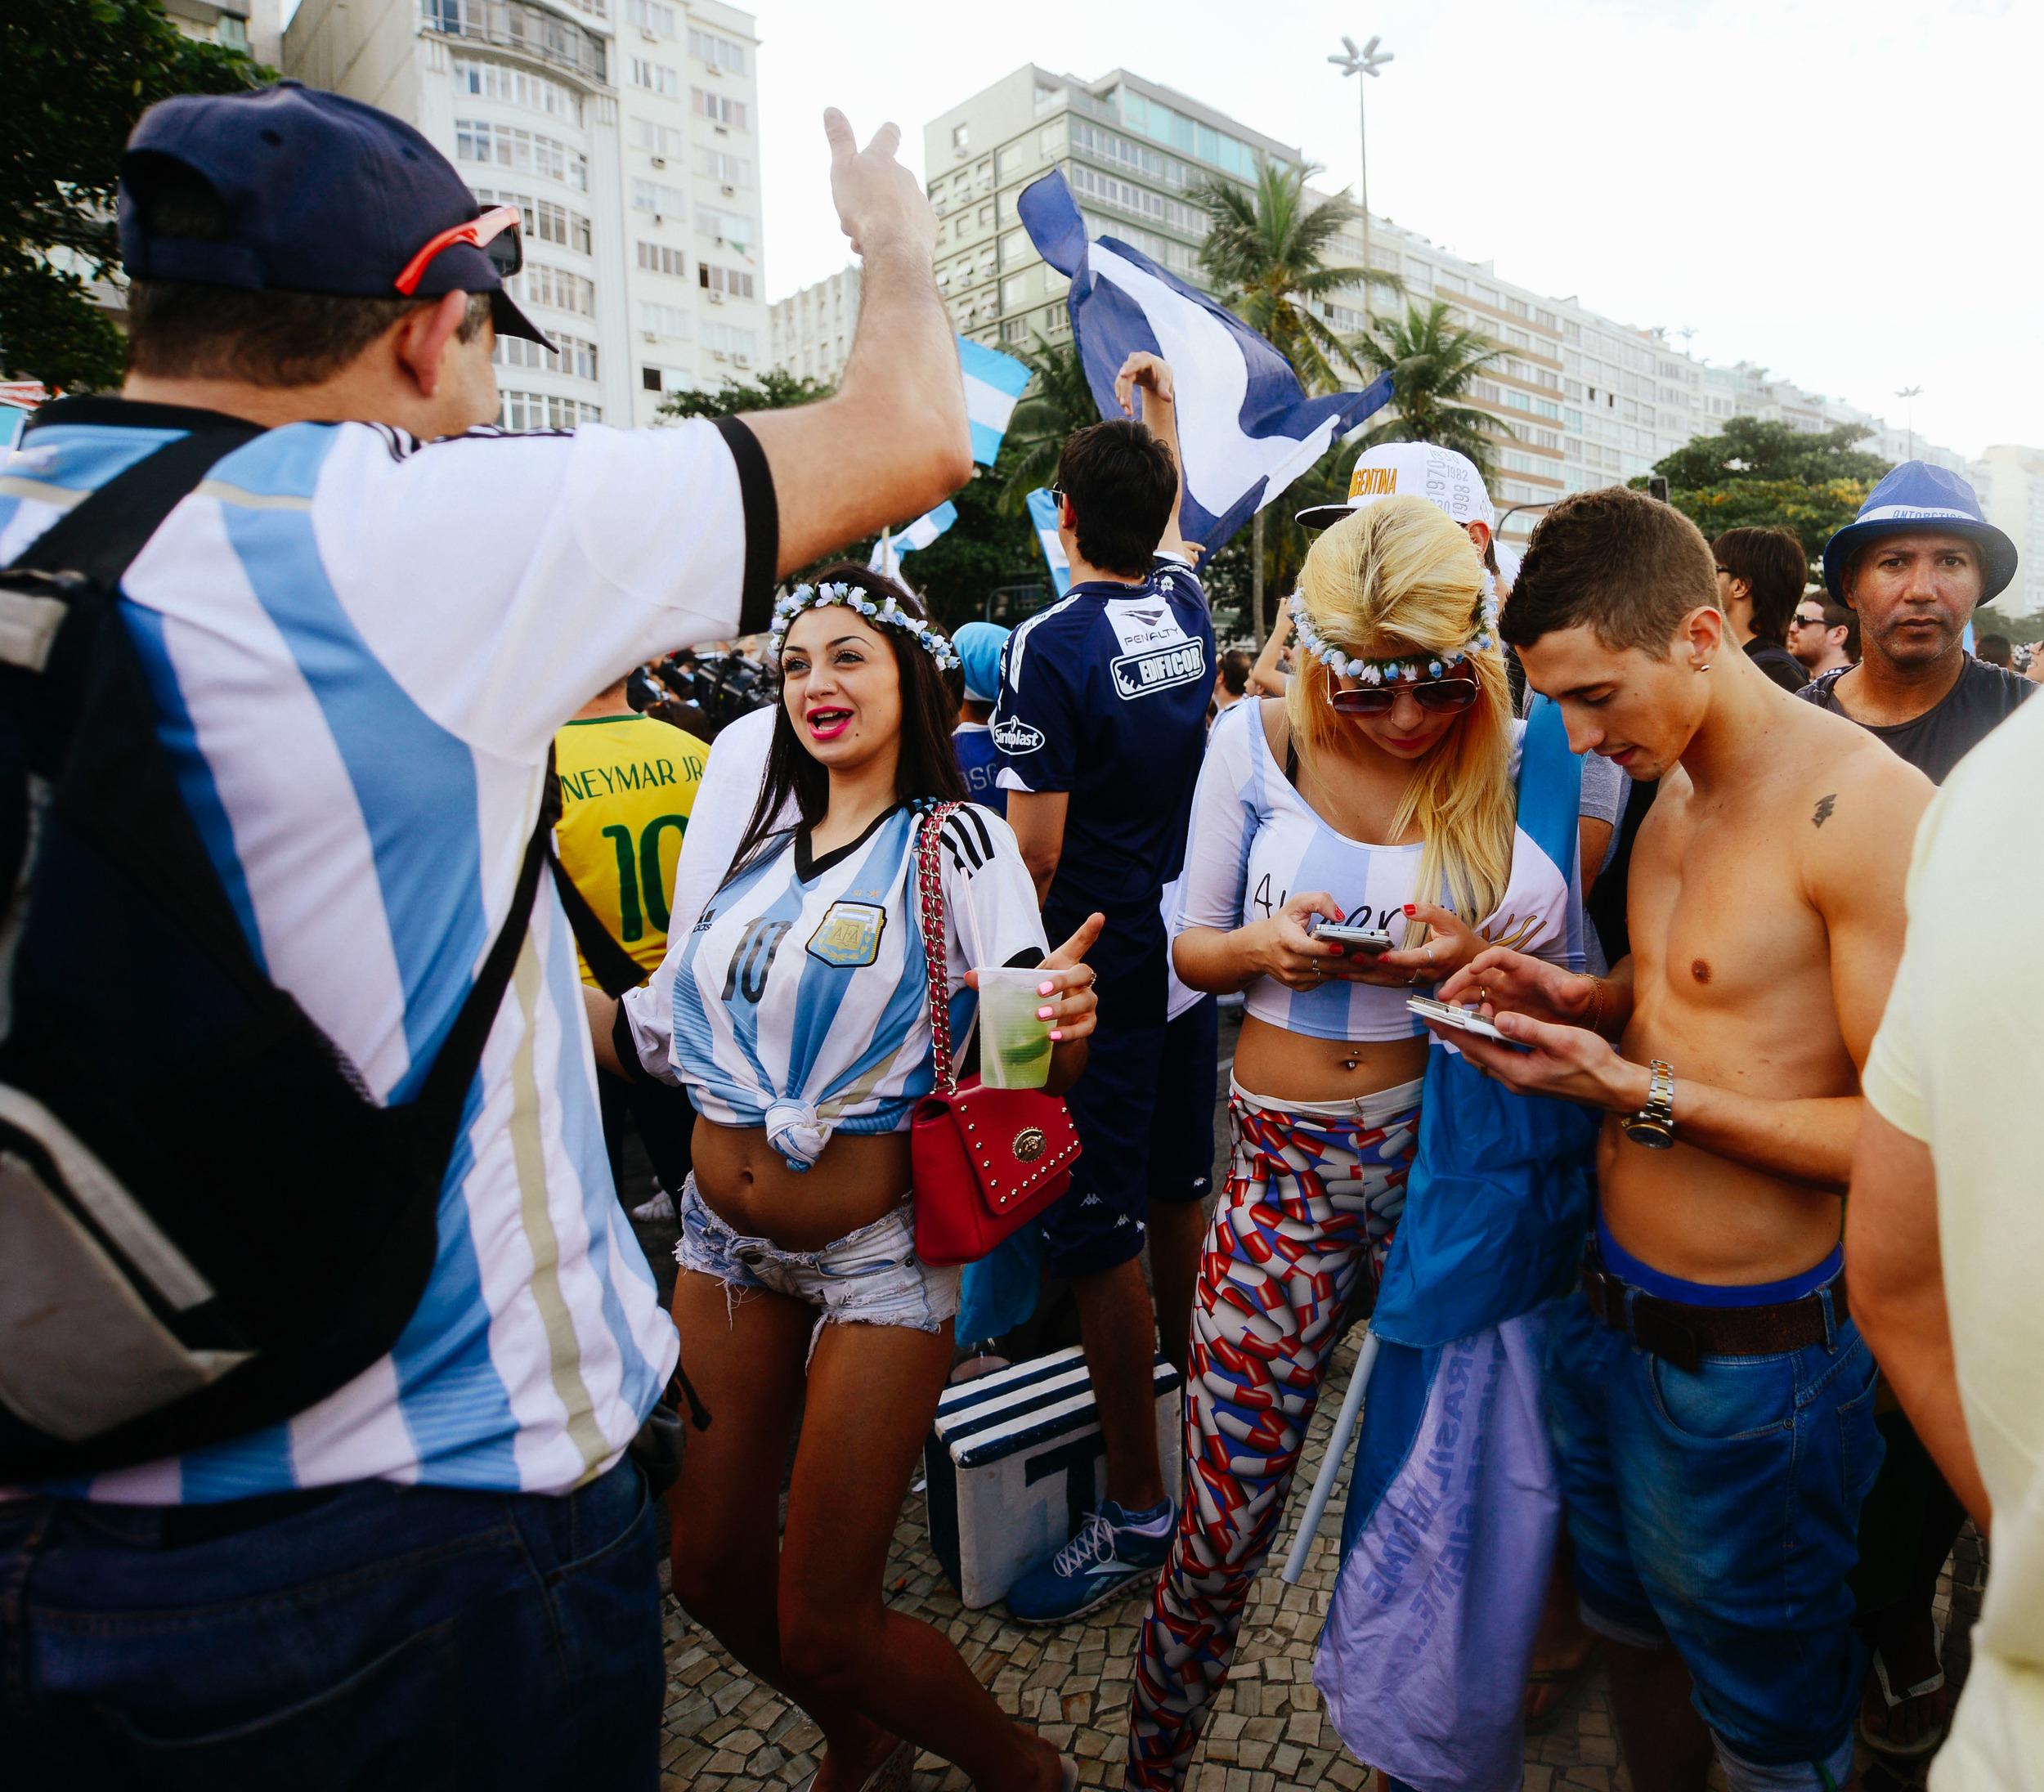 Rio de Janeiro, Brazil, 2014